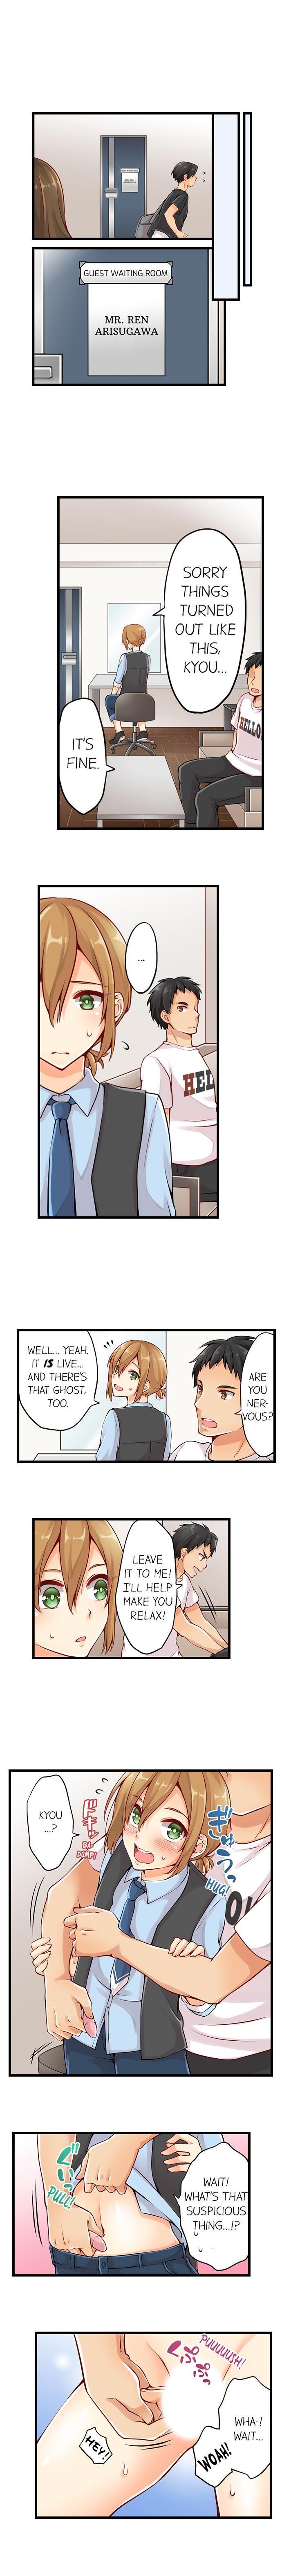 Ren Arisugawa Is Actually A Girl 25